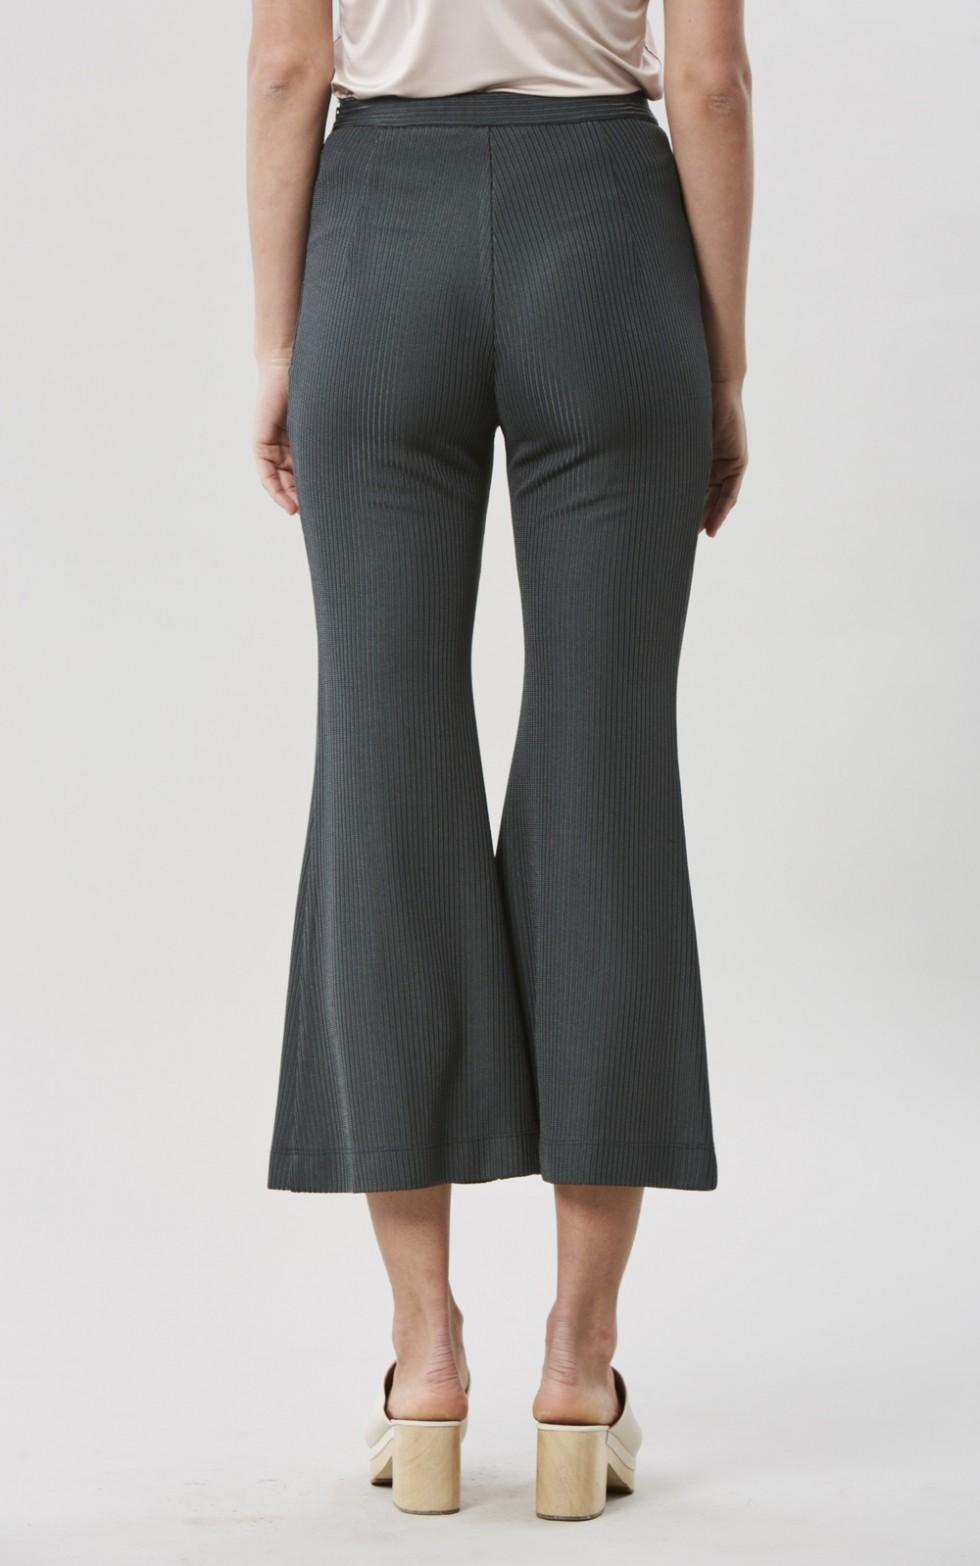 Rachel Comey - Burdan Pant - Clothing - Shop